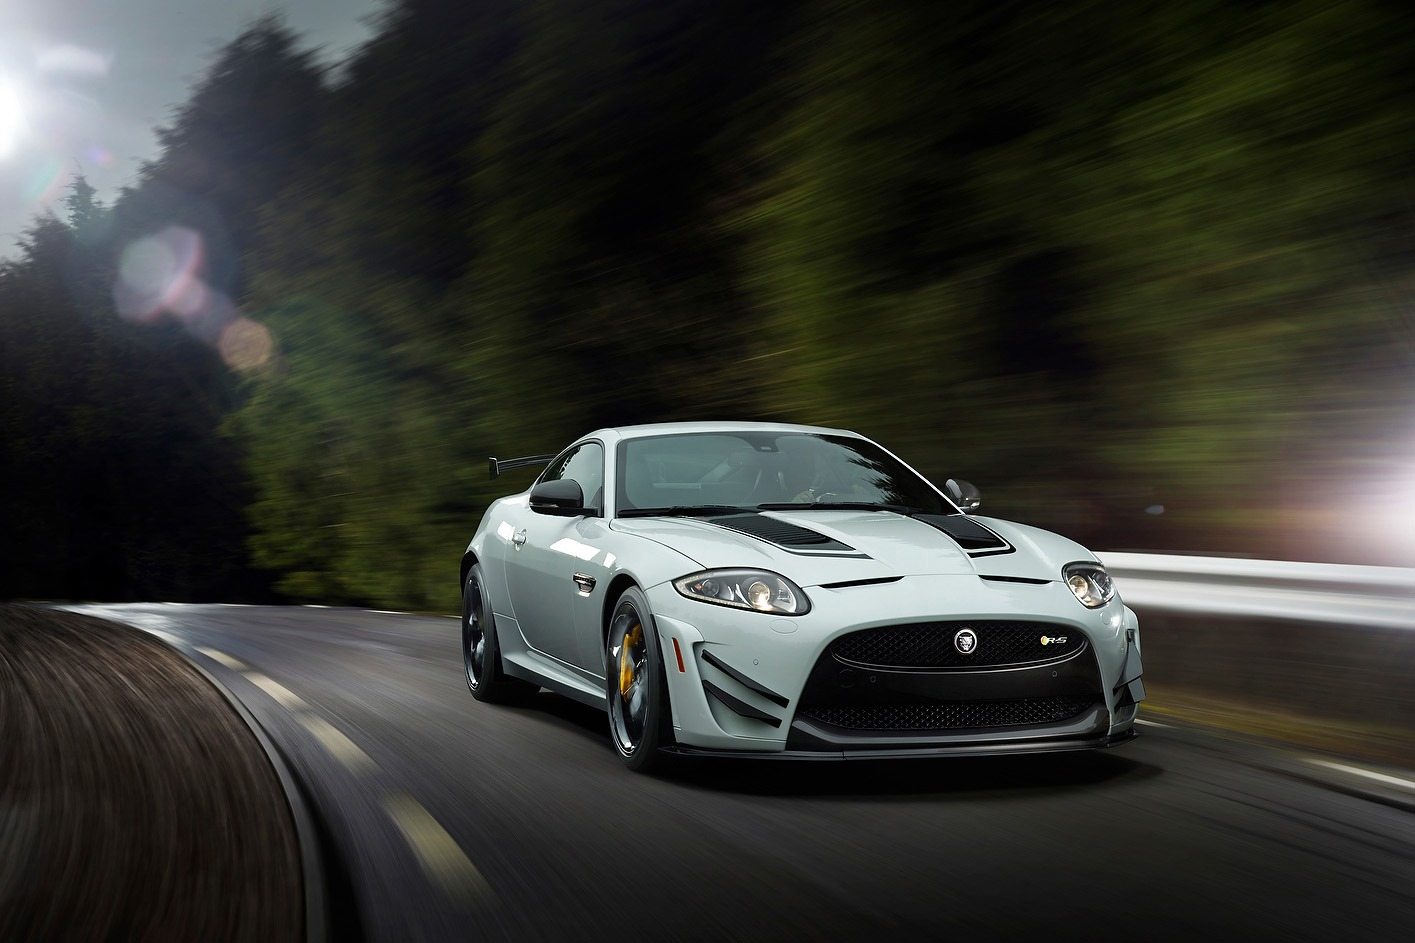 jaguar-xkr-s-gt-5%5B3%5D.jpg